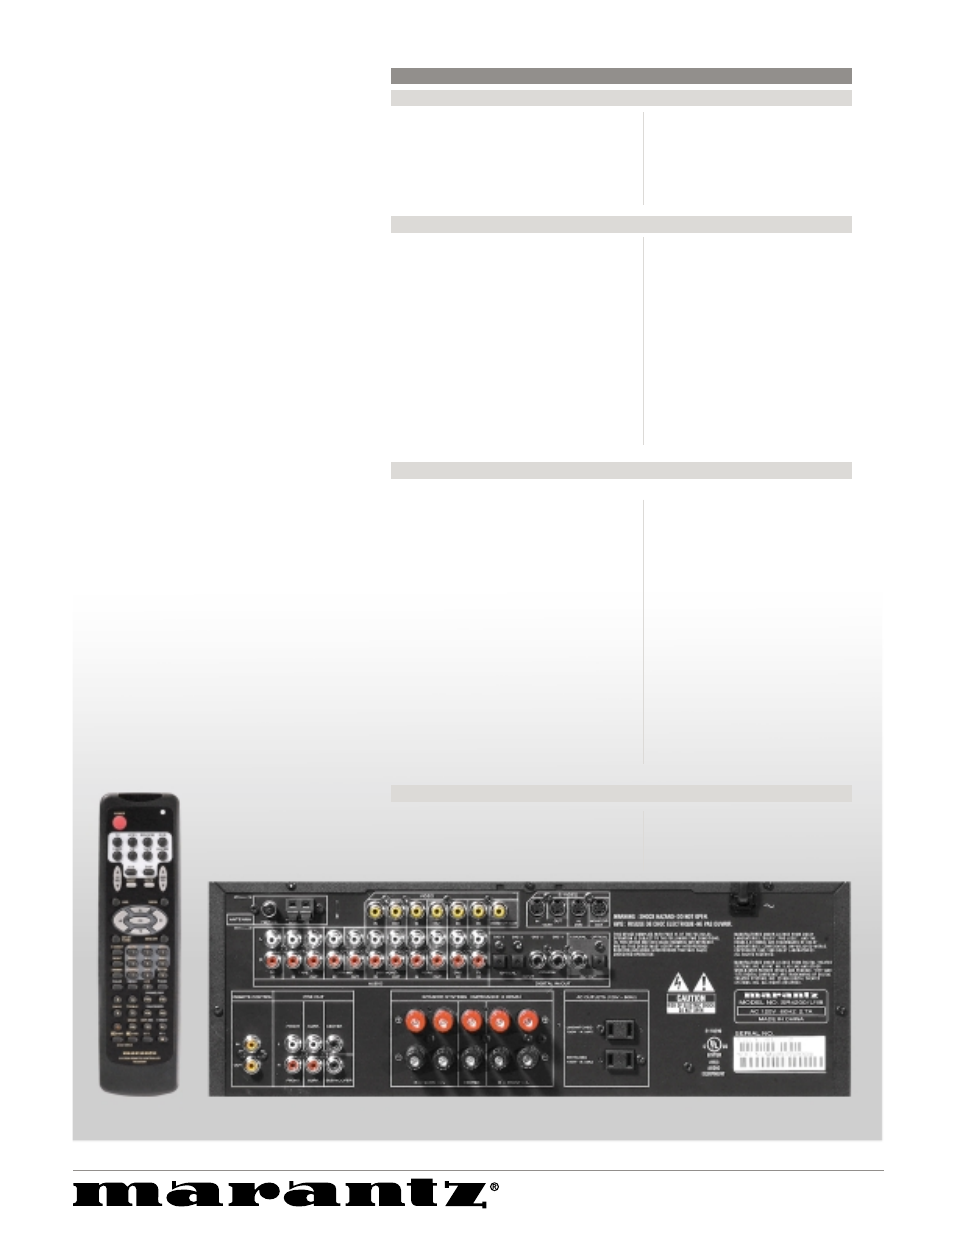 sr4200 a v receiver marantz sr4200 user manual page 2 2 rh manualsdir com marantz sr4600 user manual marantz sr4600 user manual